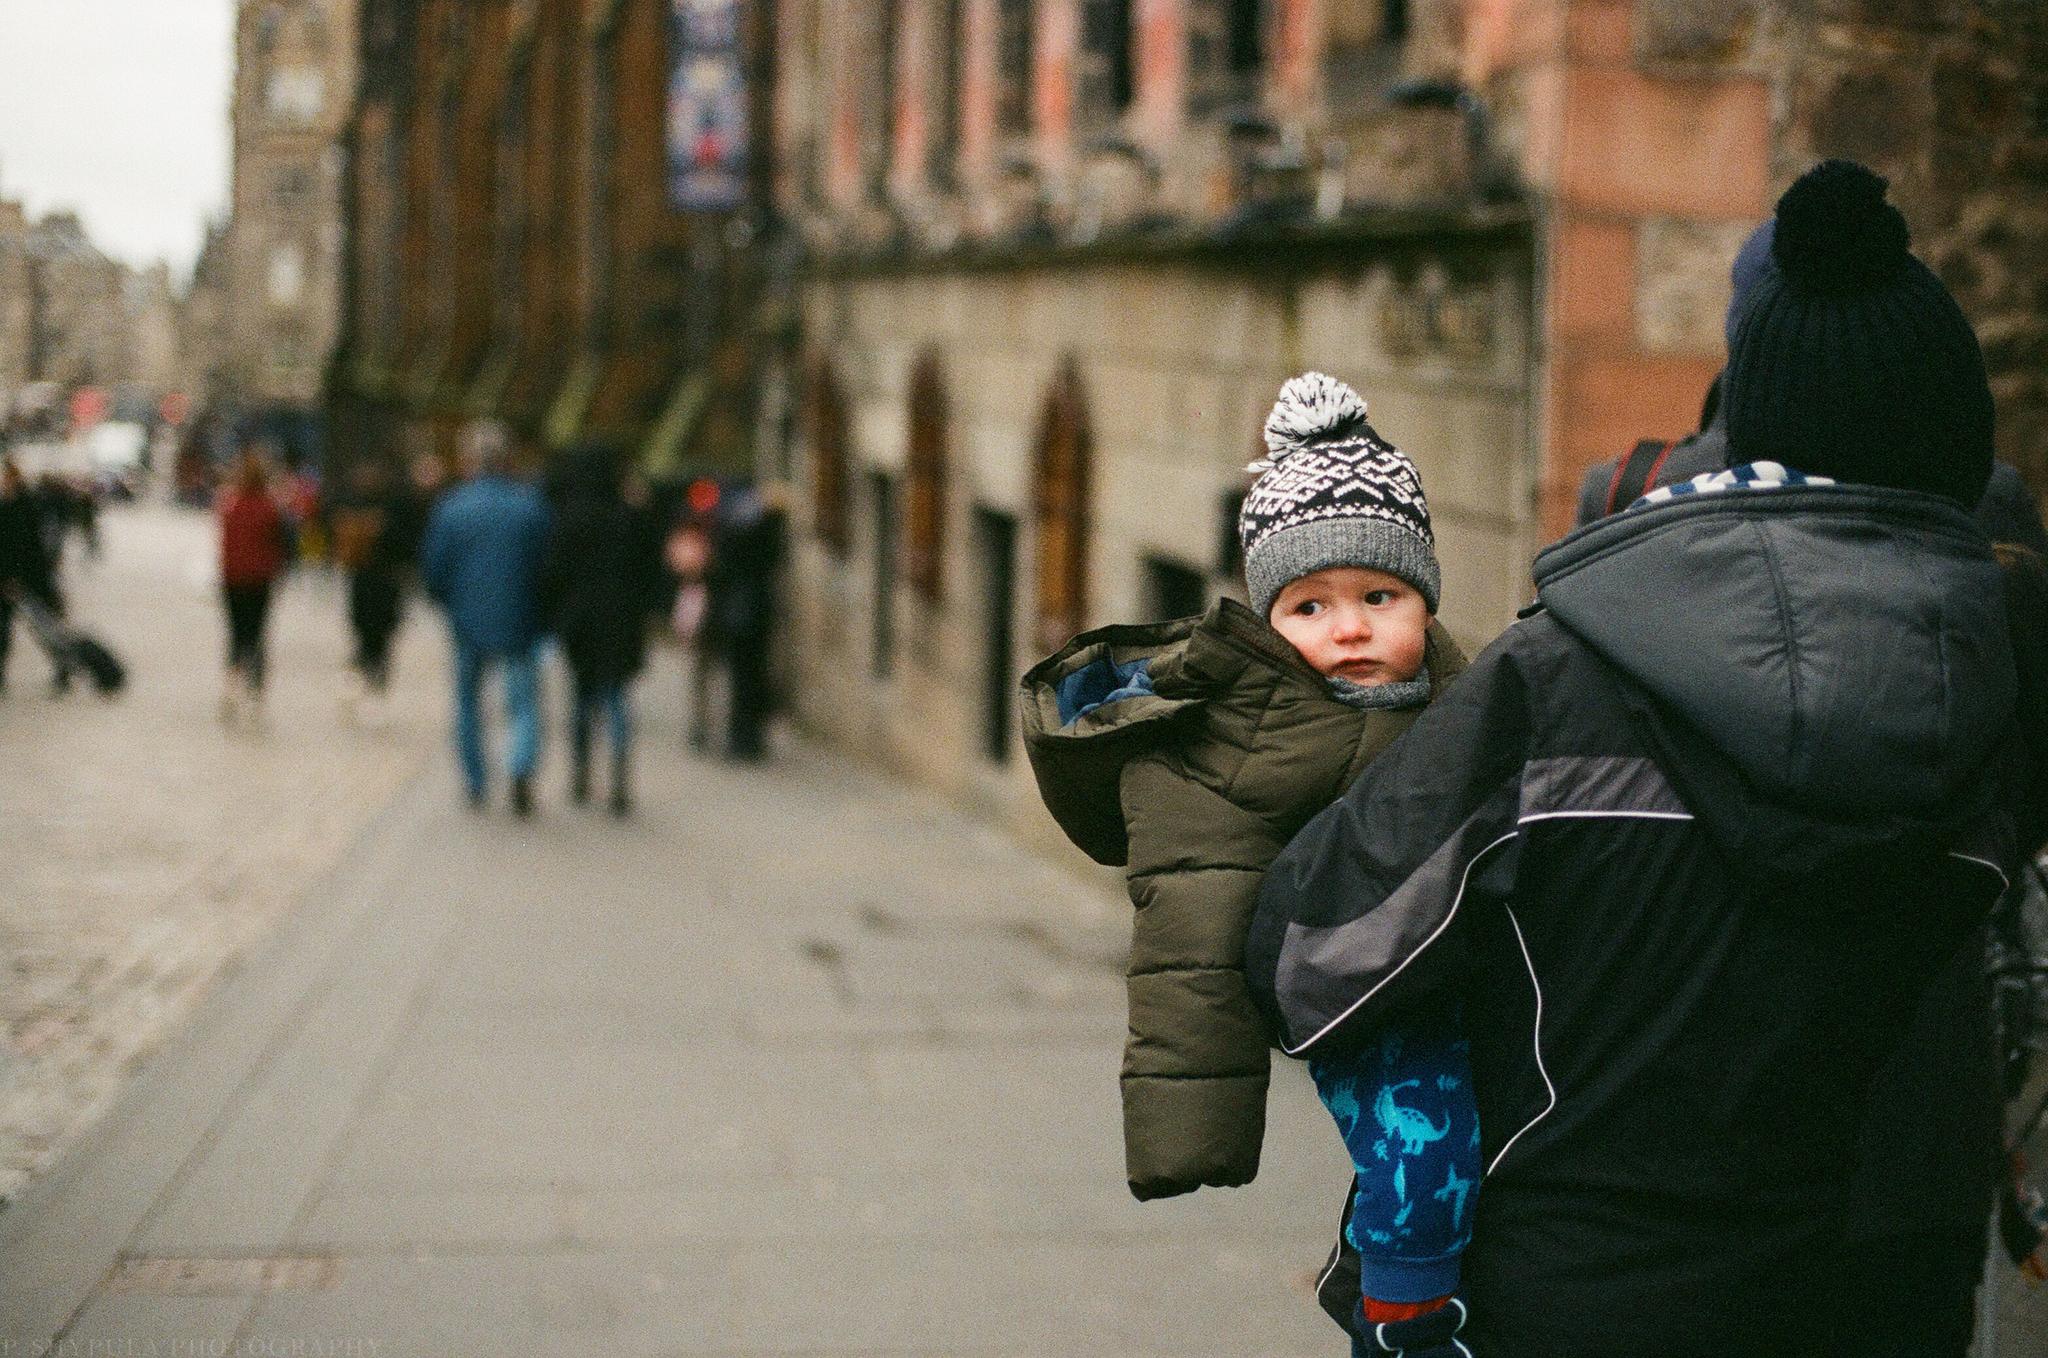 Edinburgh, Scotland Nikon FM2 + @Lomography F²/400